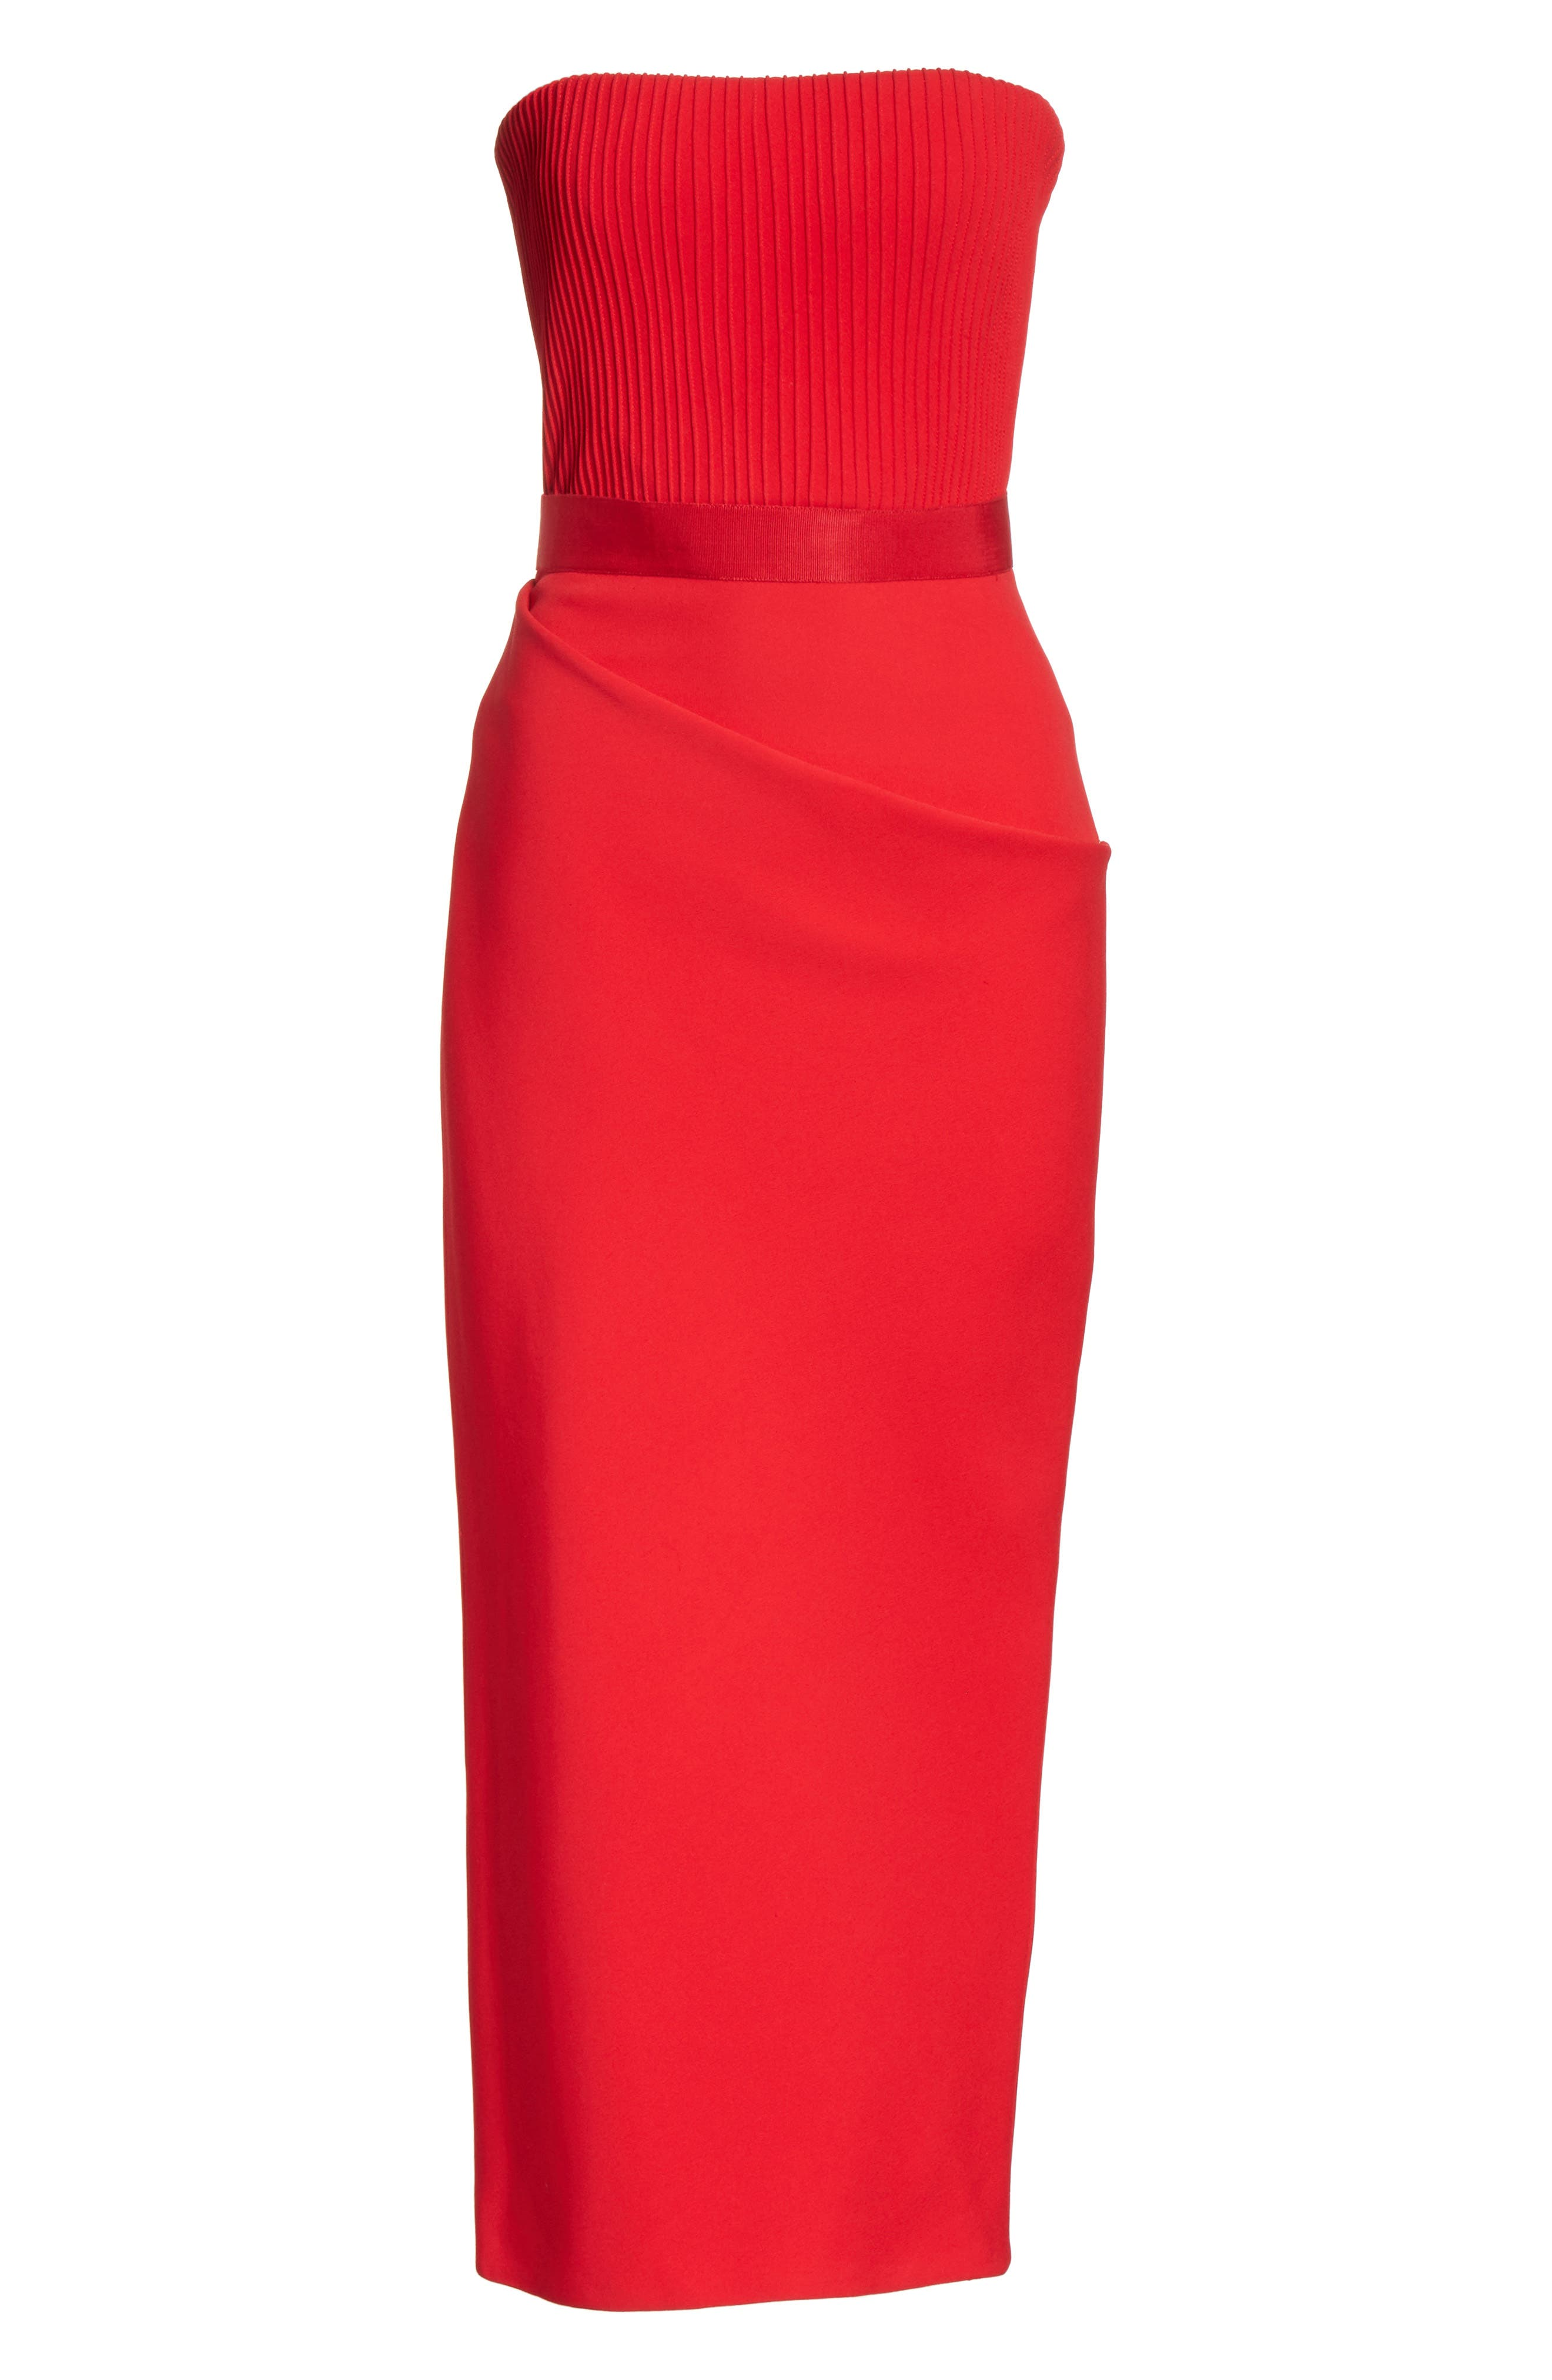 Ribbed Bodice Midi Dress,                             Alternate thumbnail 6, color,                             600